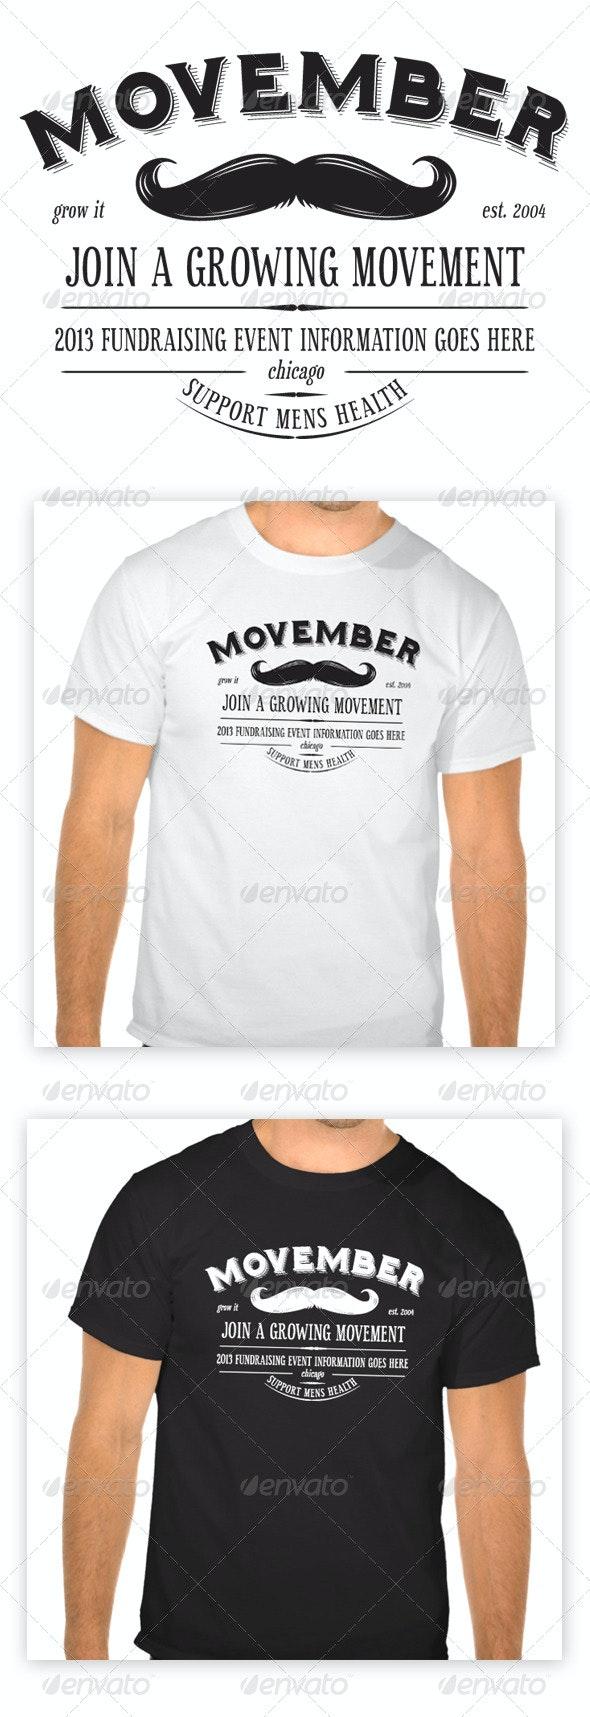 Movember T-Shirt - Events T-Shirts